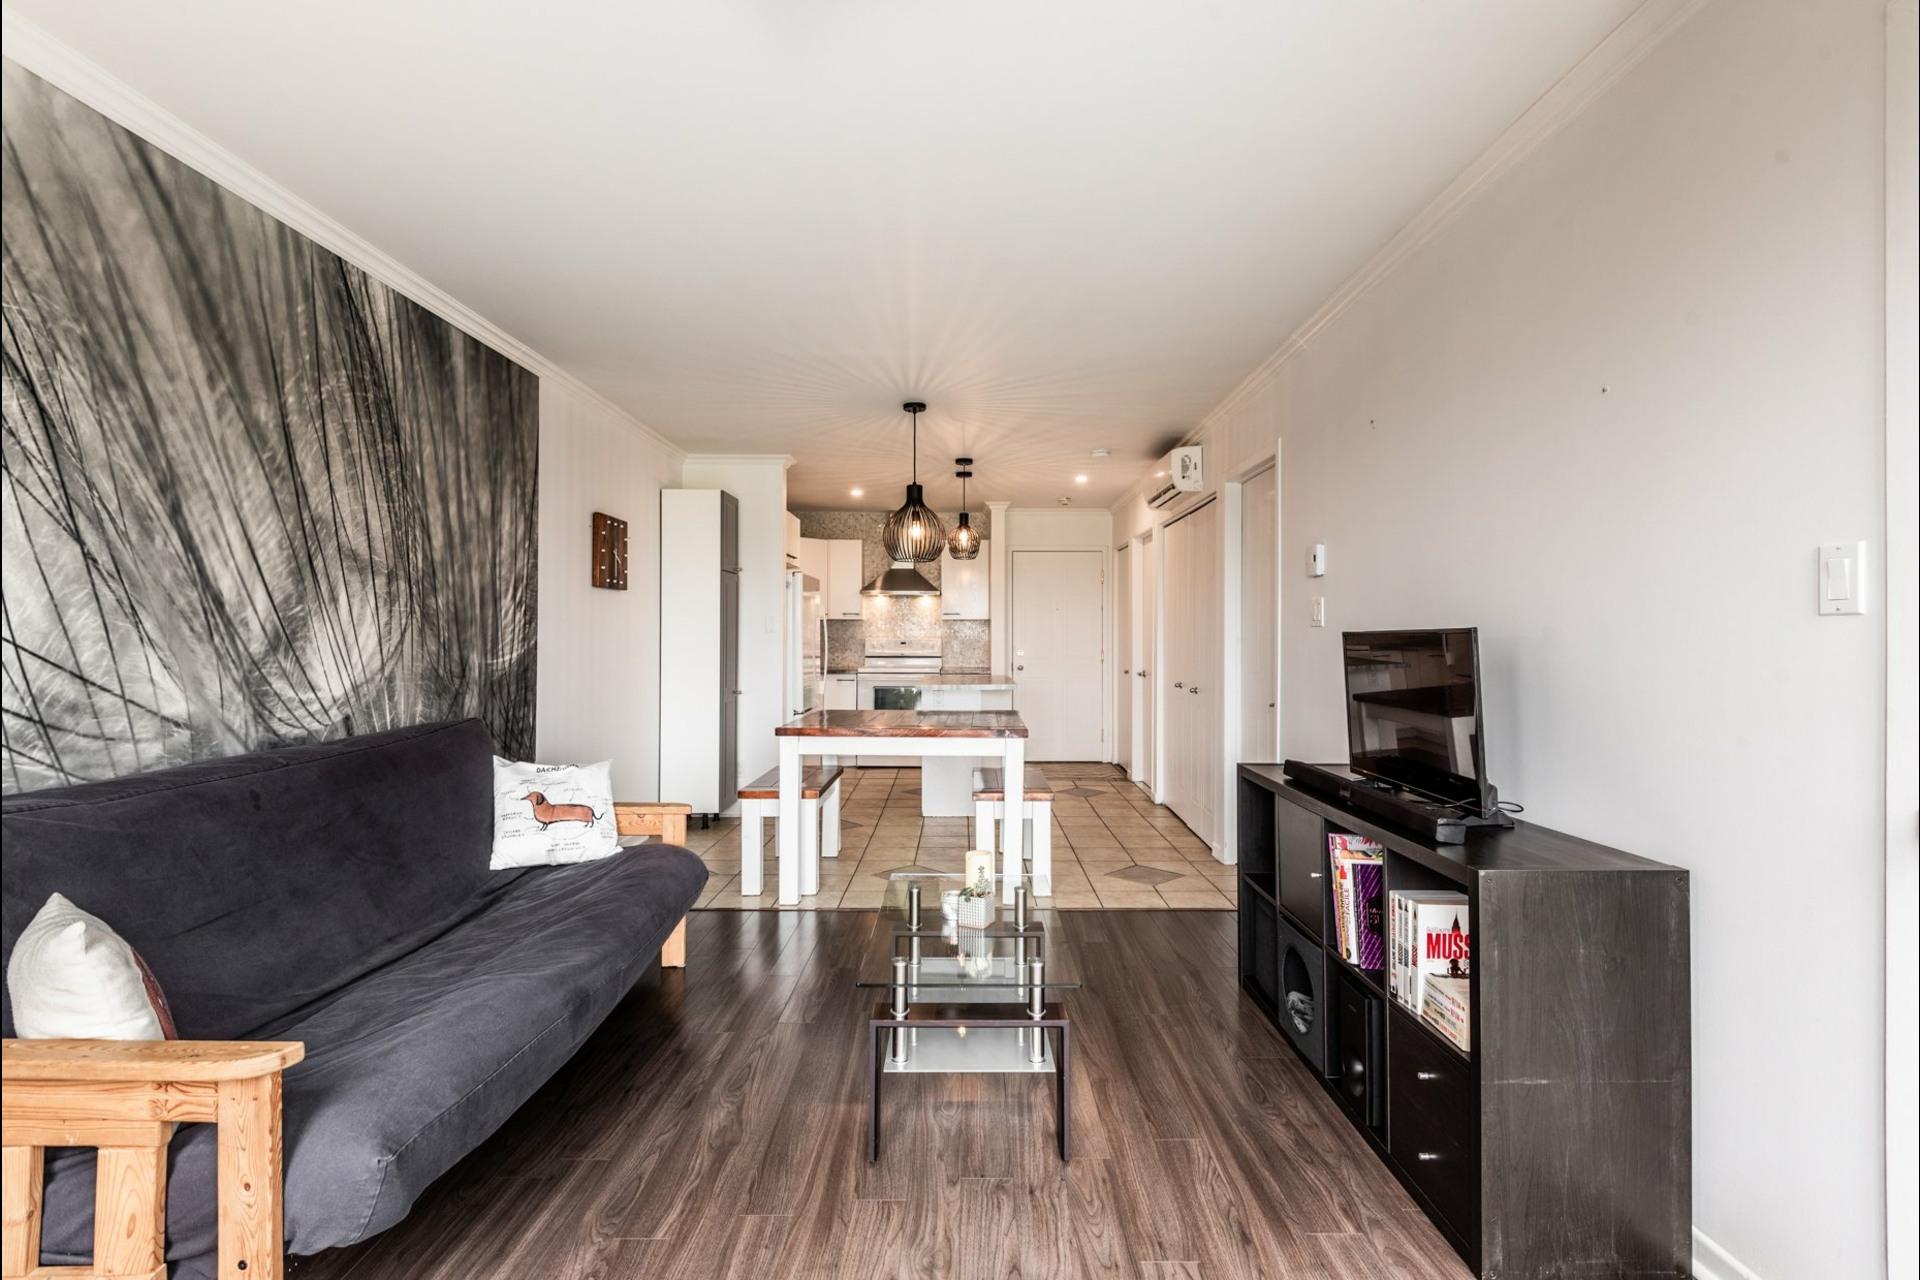 image 12 - Apartment For sale Saint-Hubert Longueuil  - 4 rooms